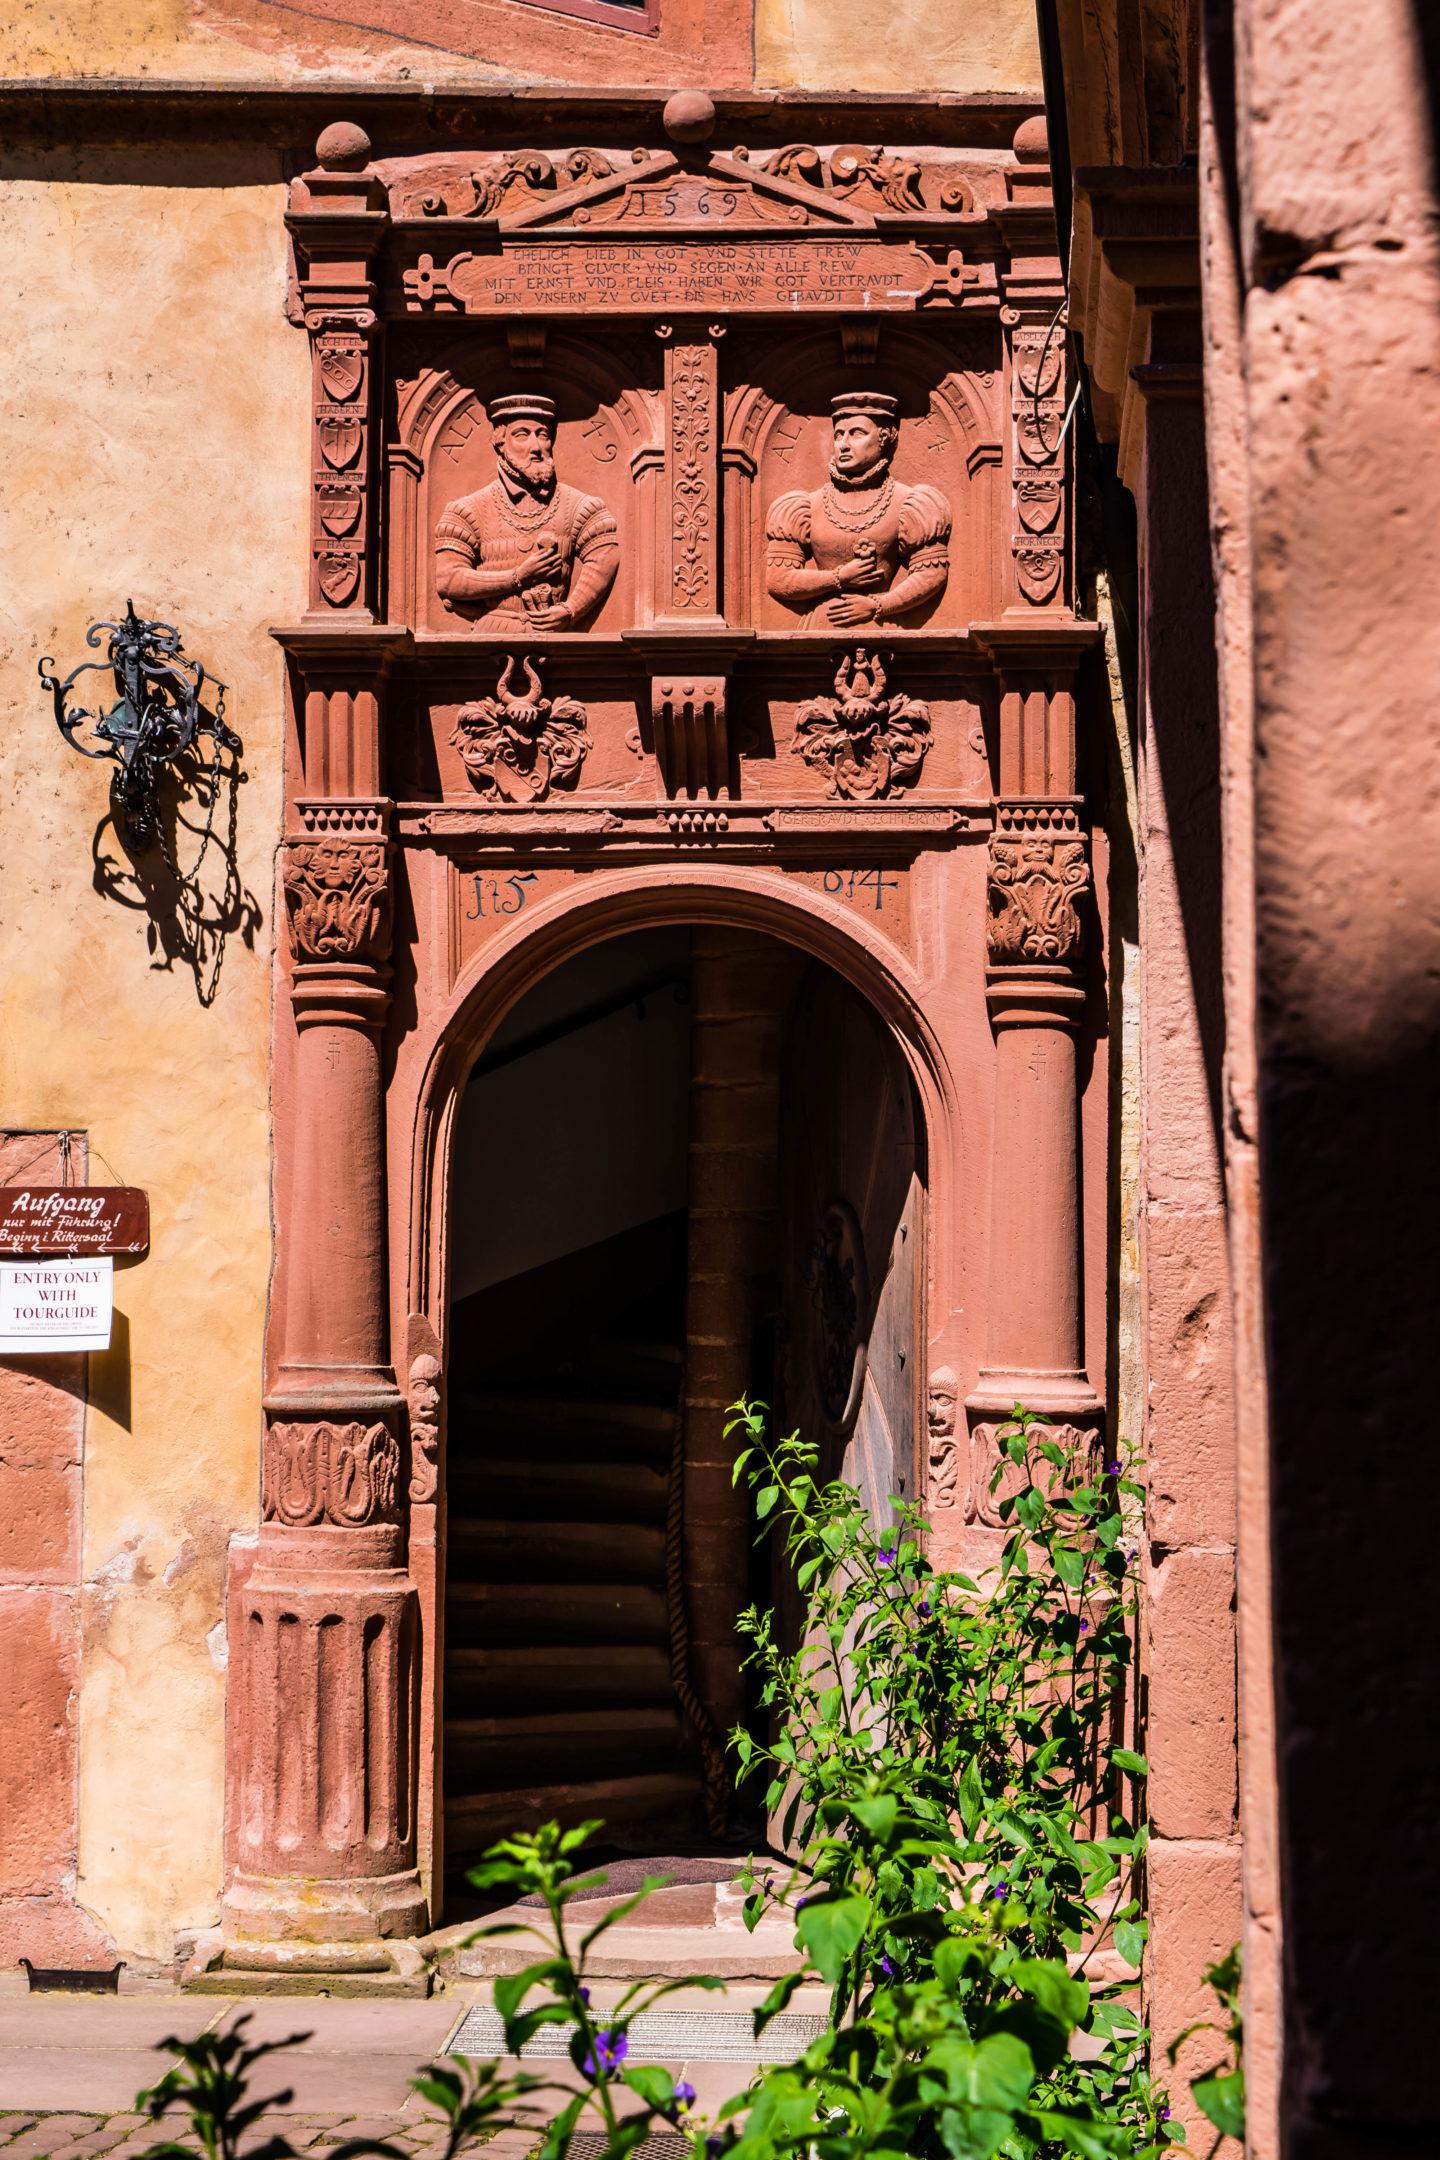 Door to upper levels of the castle, dated 1569.